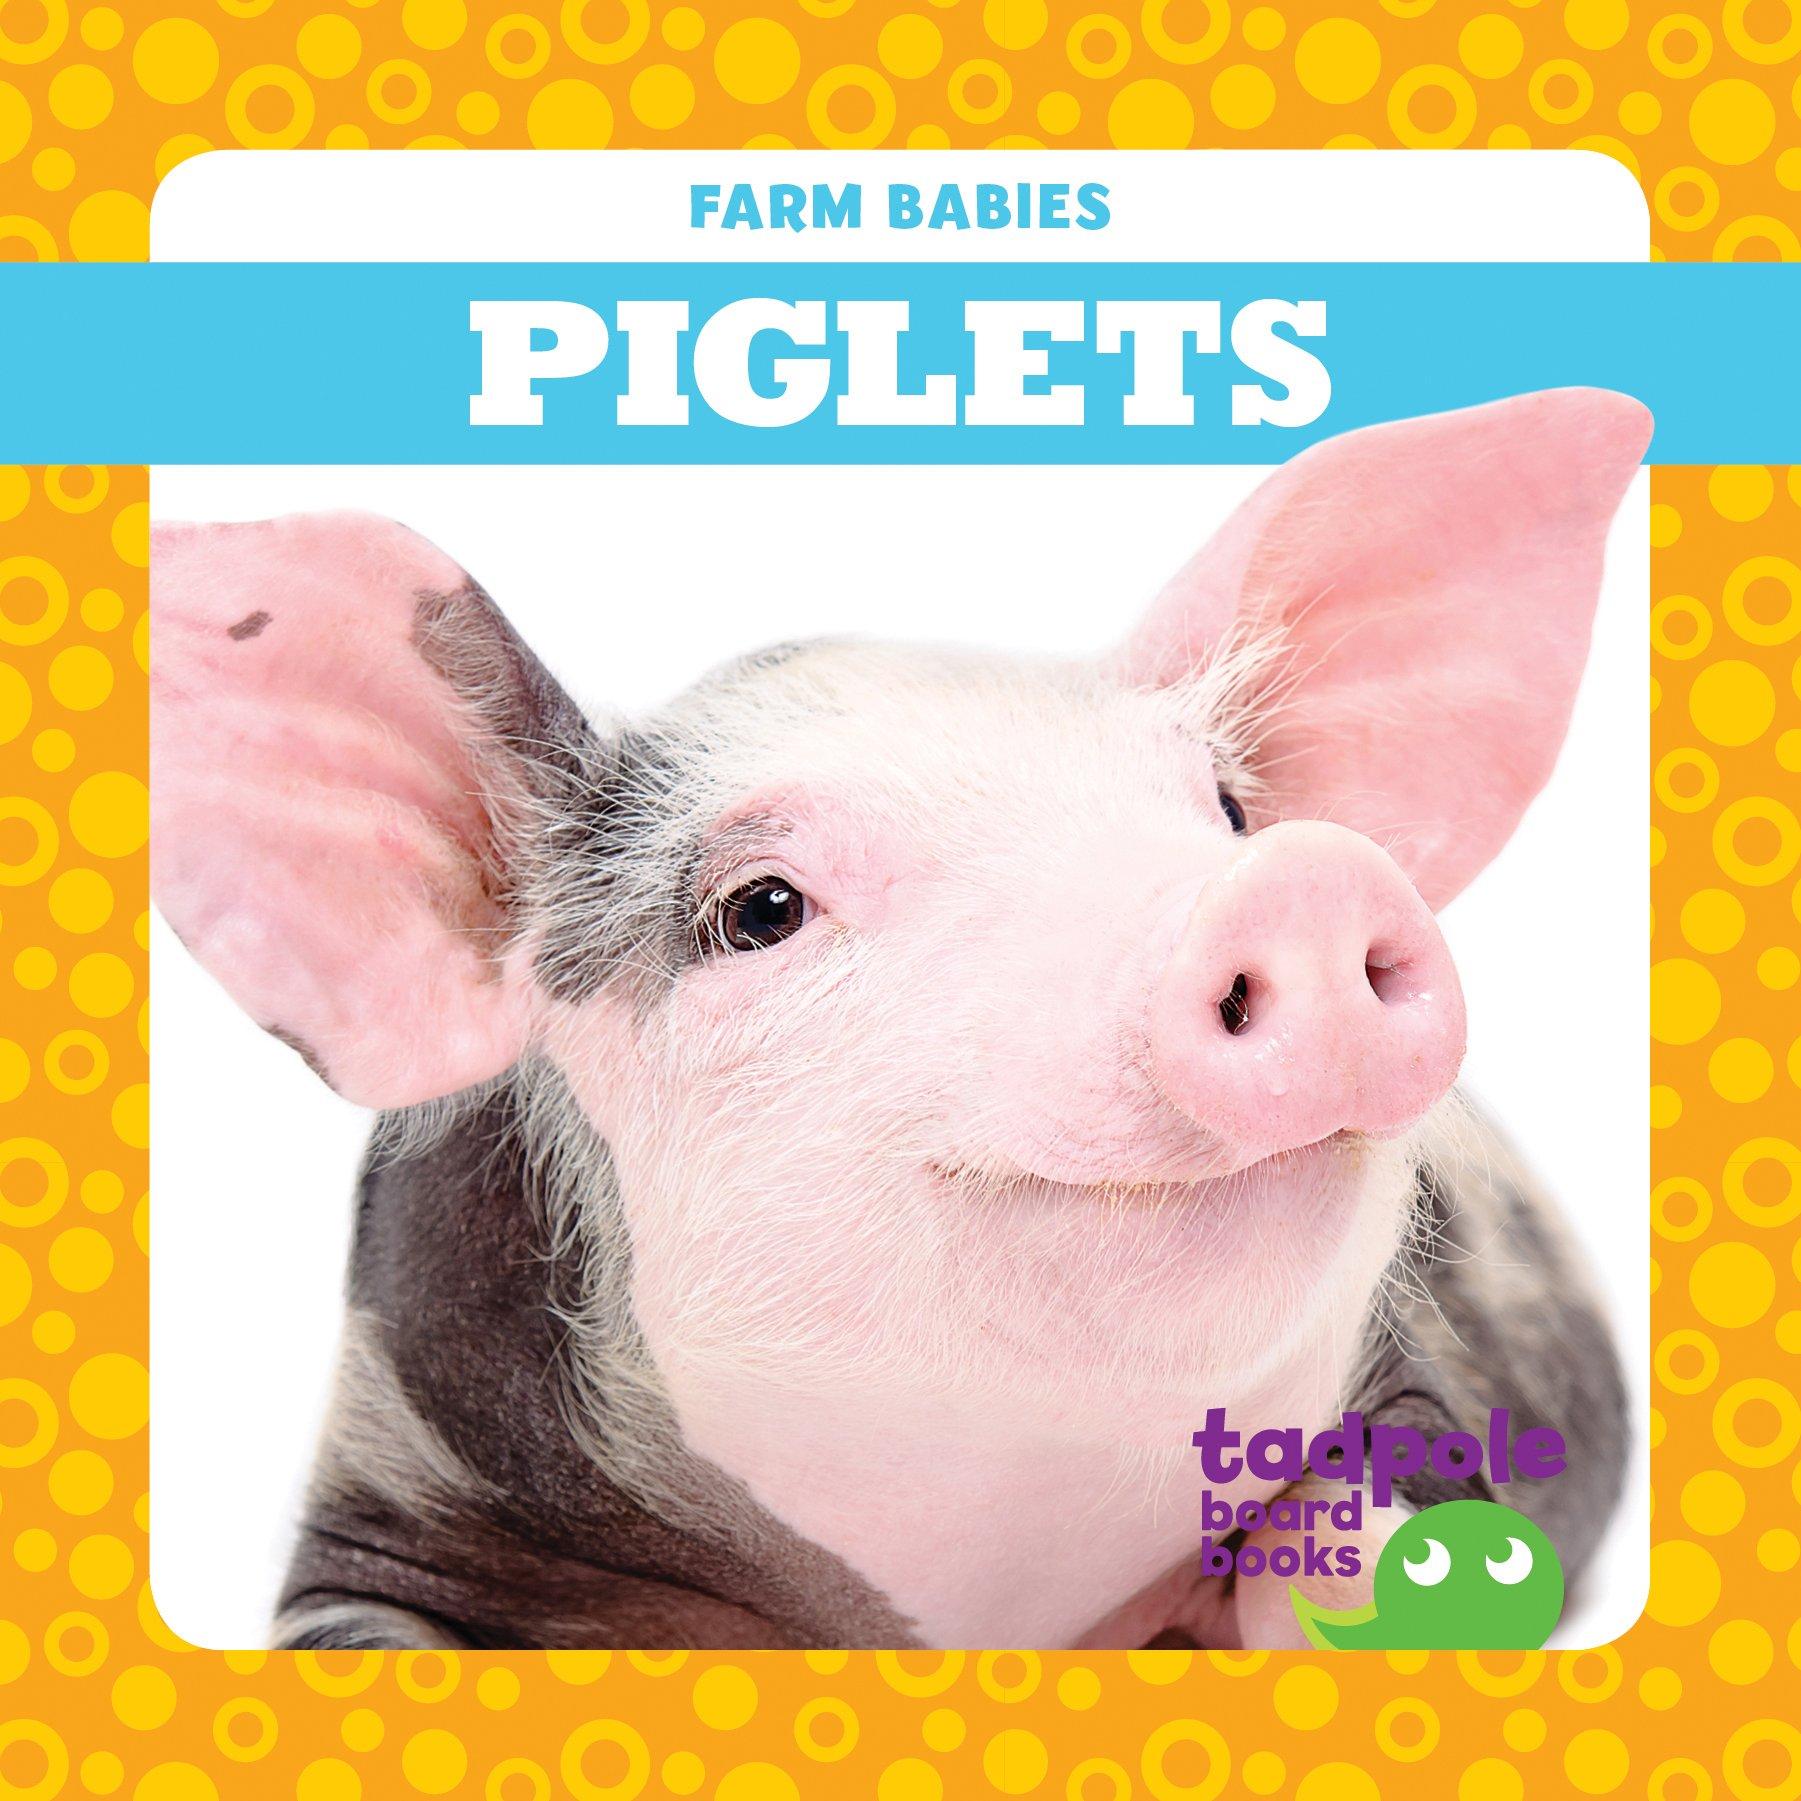 Piglets (Tadpole Board Books: Farm Babies) ebook